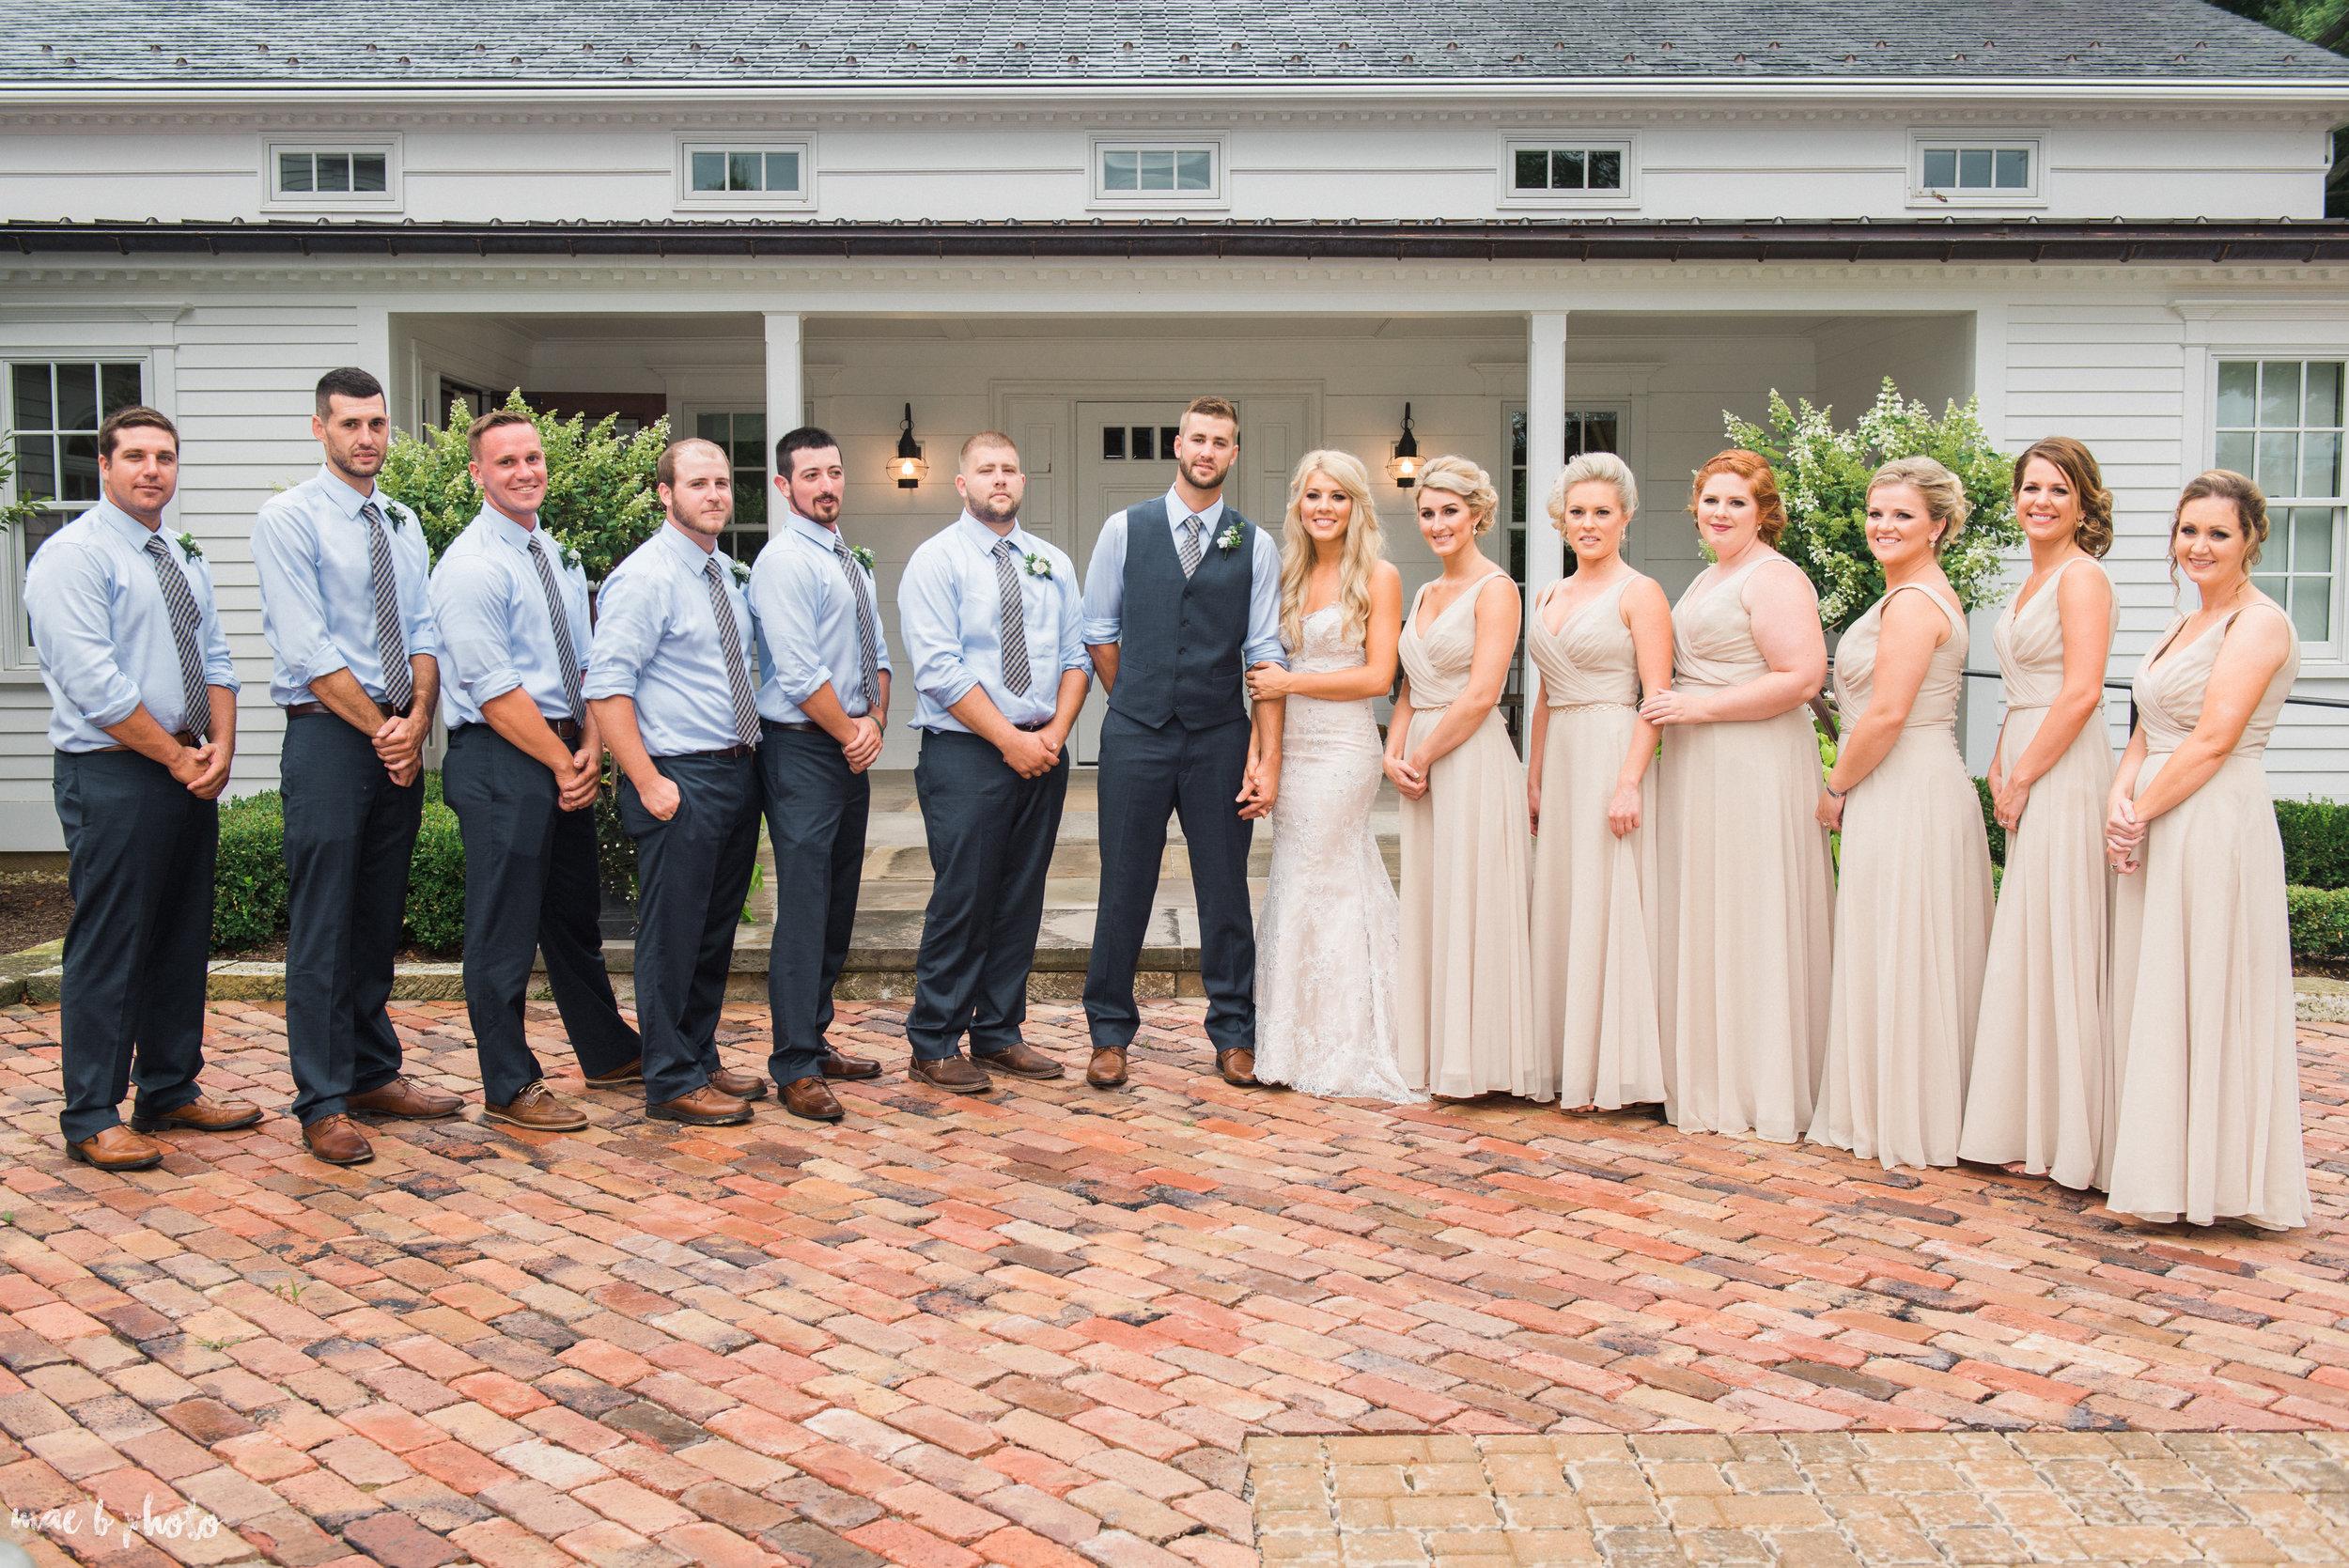 Tara & Matt's Elegant Backyard Summer Wedding in Kinsman, Ohio-59.jpg